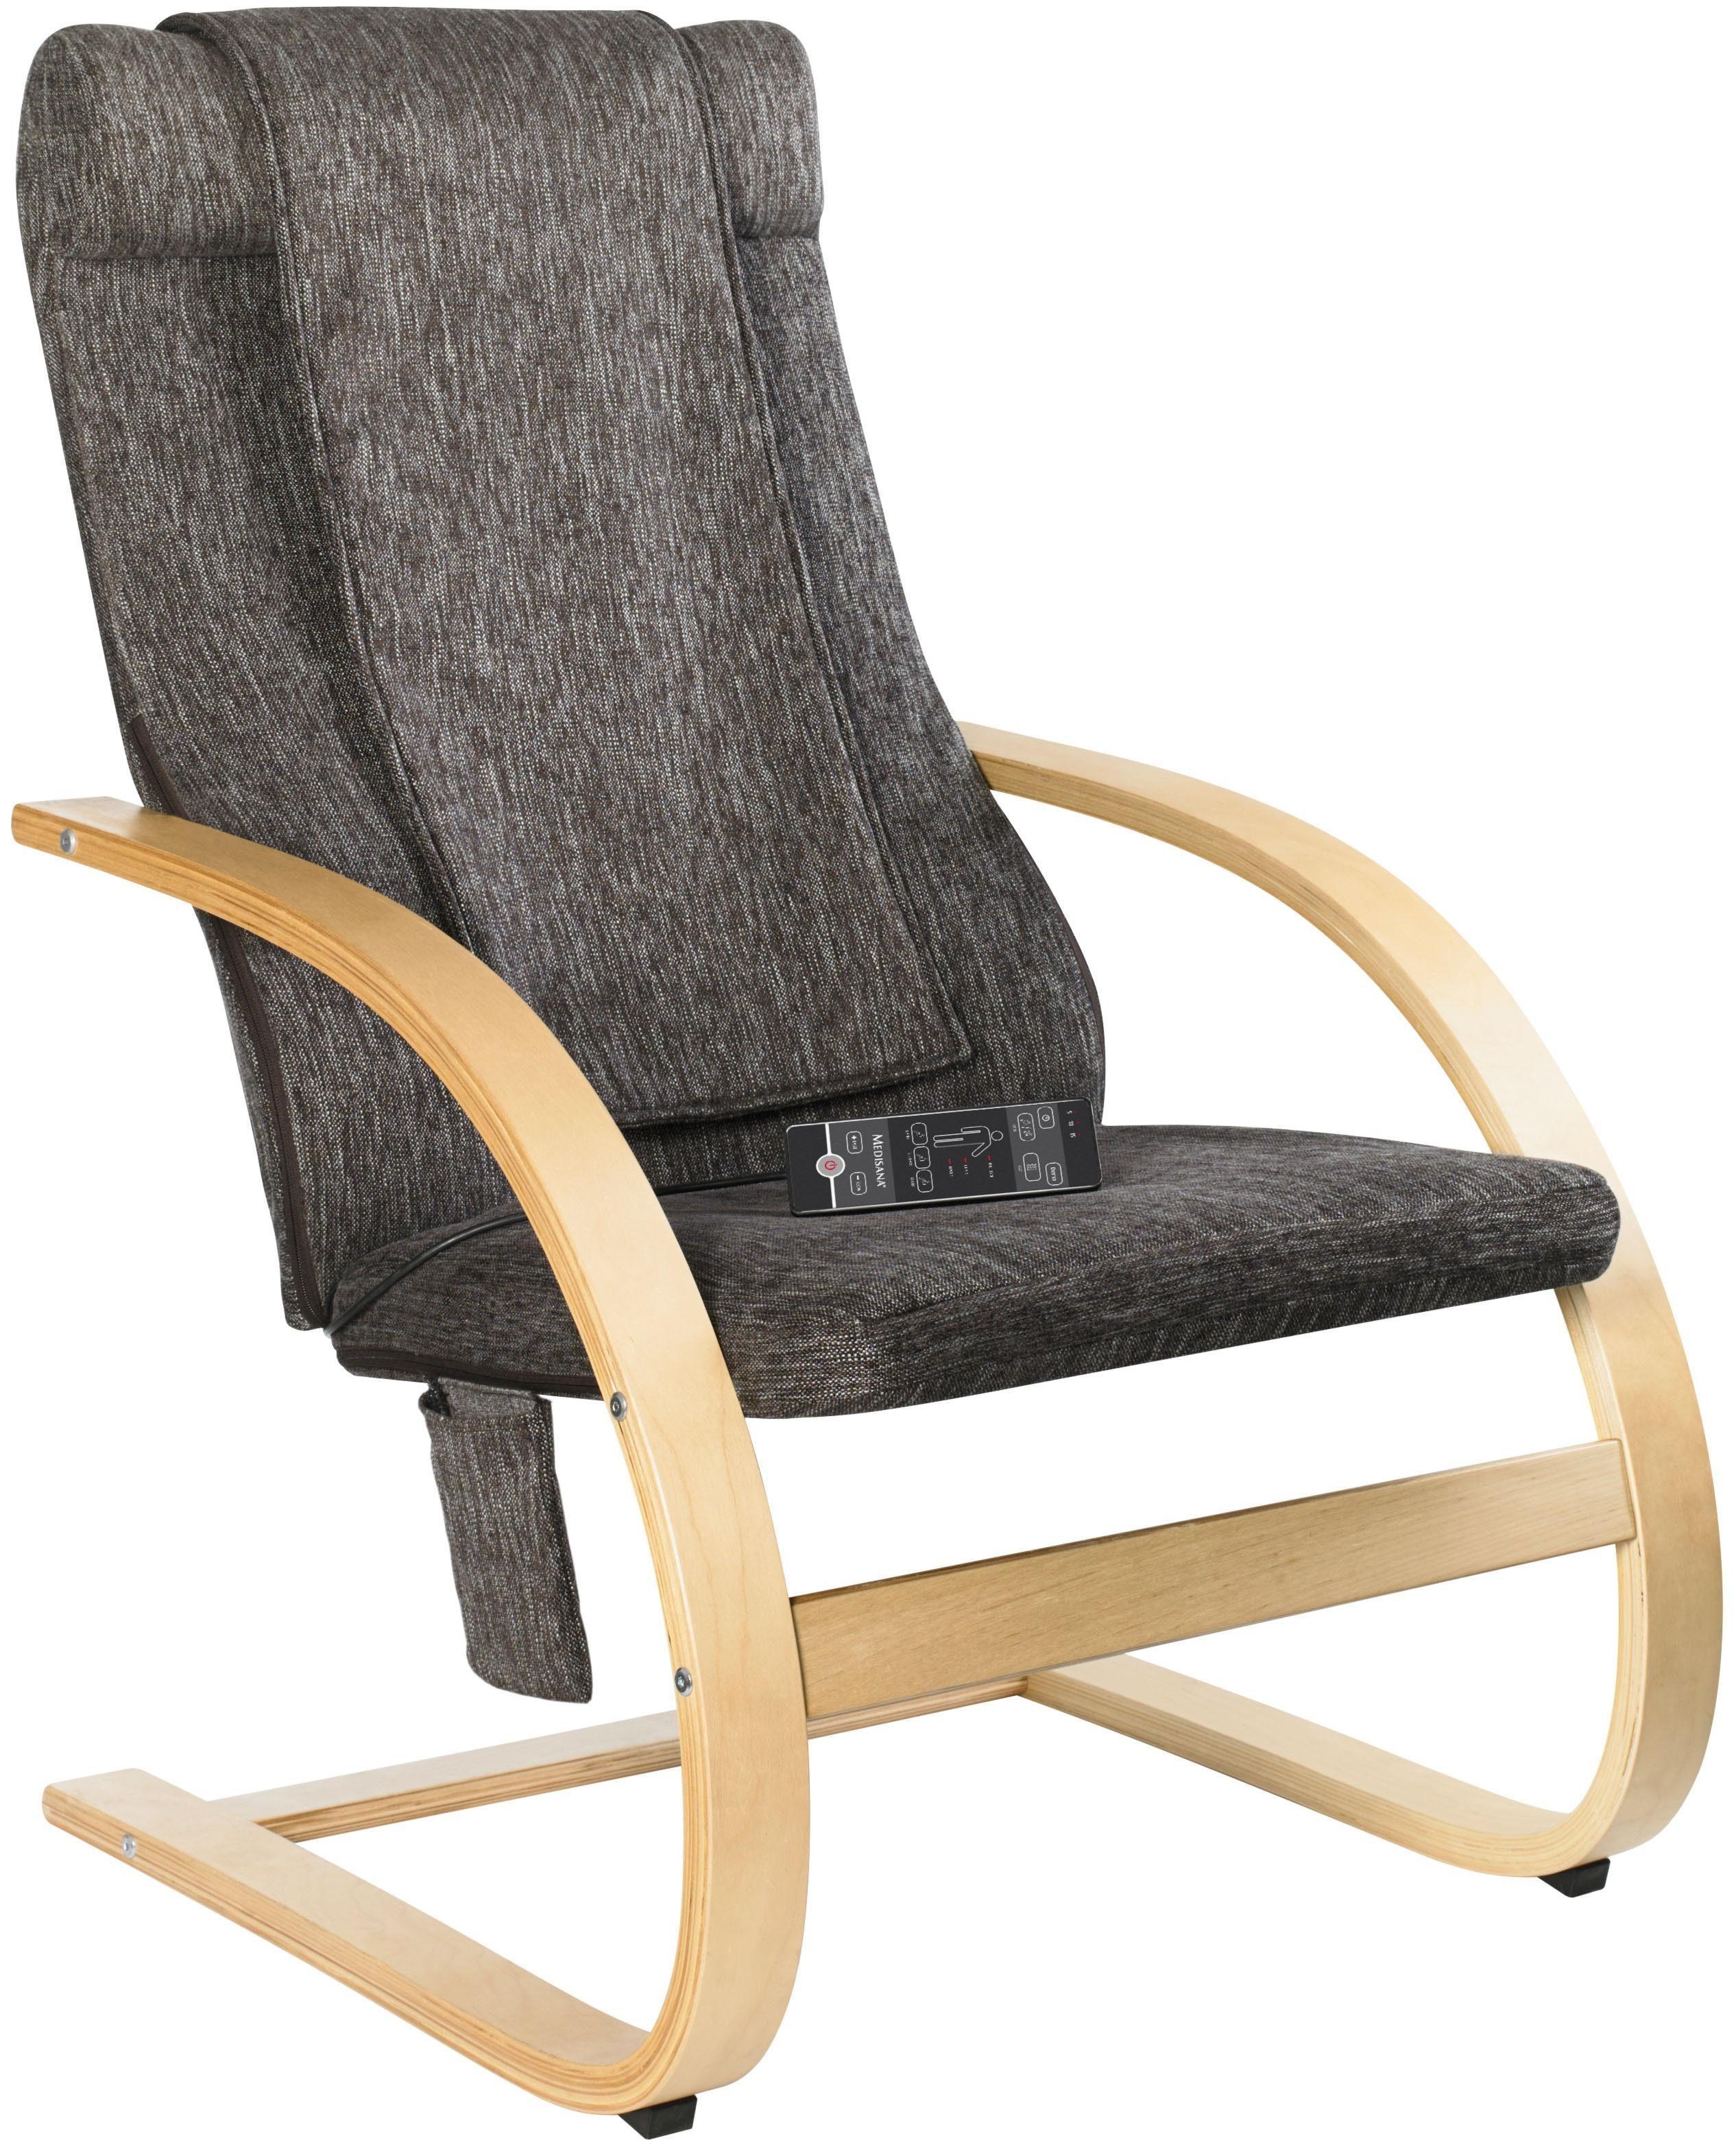 Medisana Massagesessel Relaxsessel RC 410, Belastbar bis 150 kg